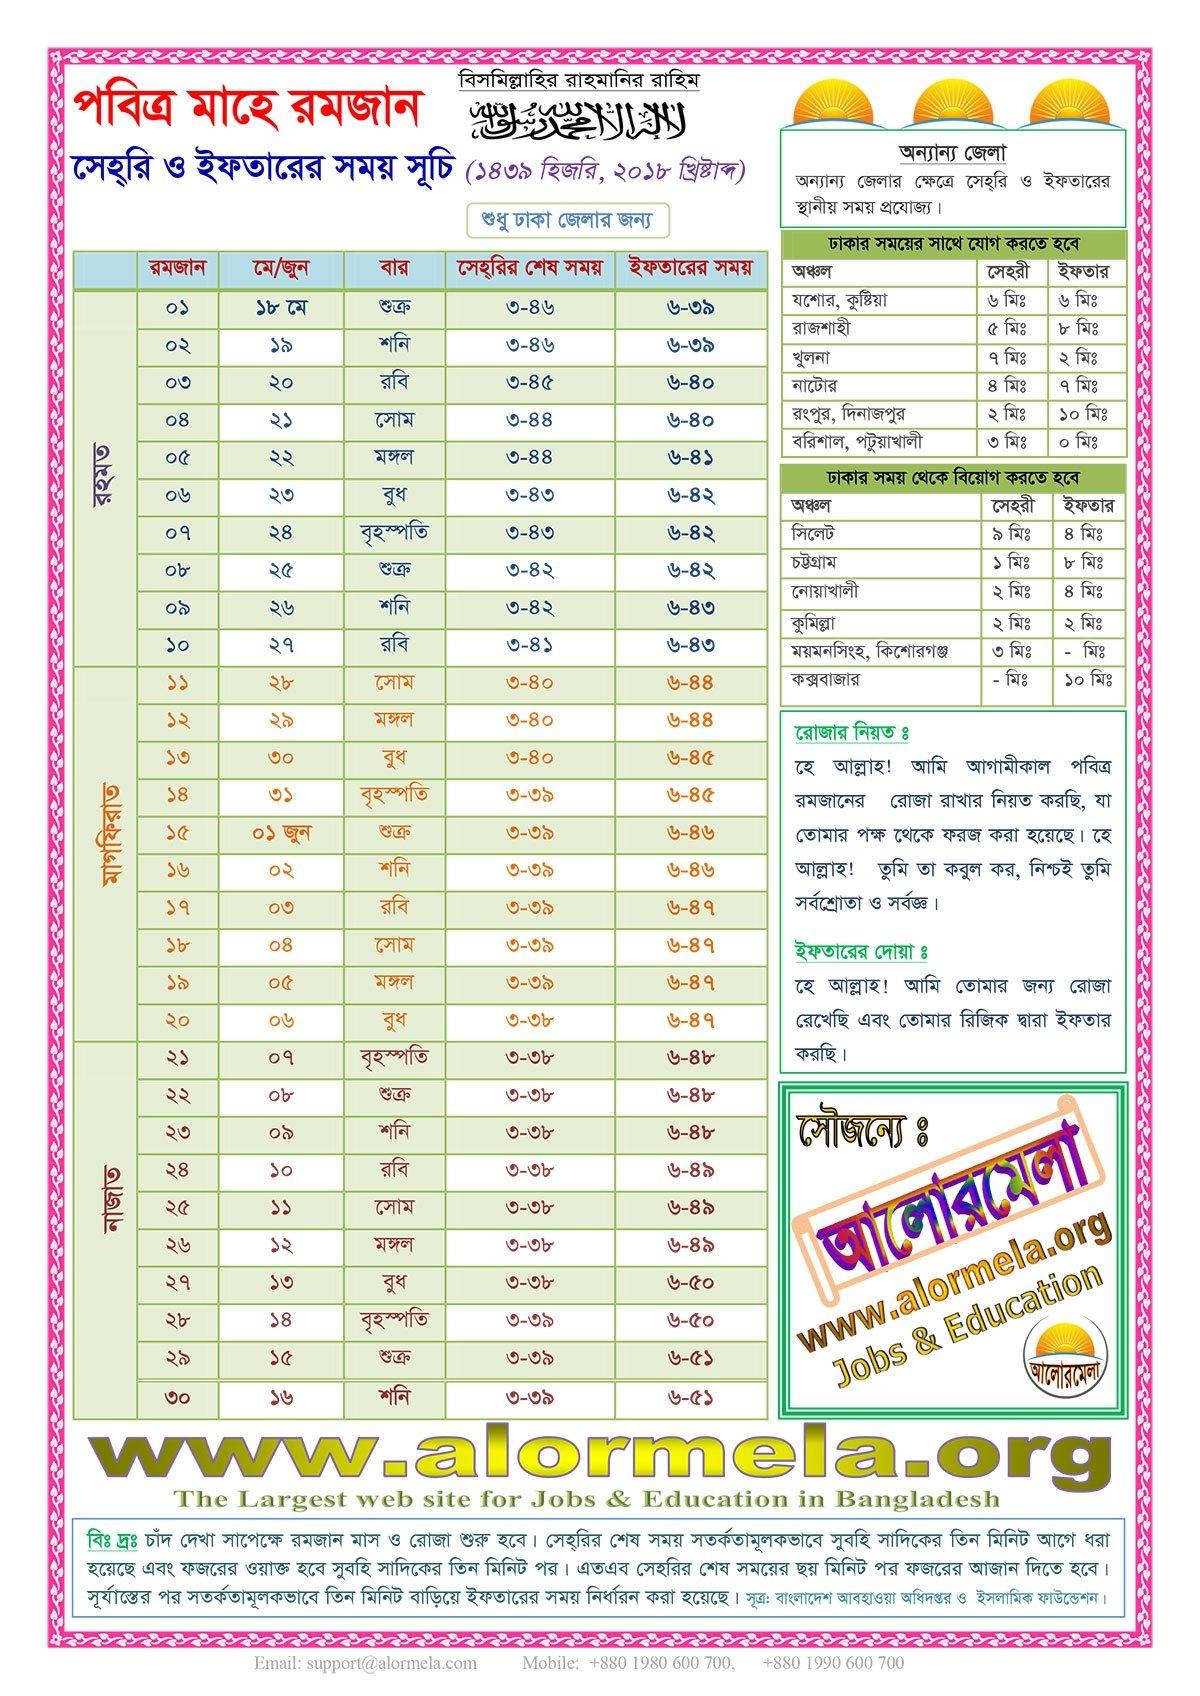 Ramadan Calendar 2018, Hijri 1439 – Alormela Calendar 2019 Ramadan